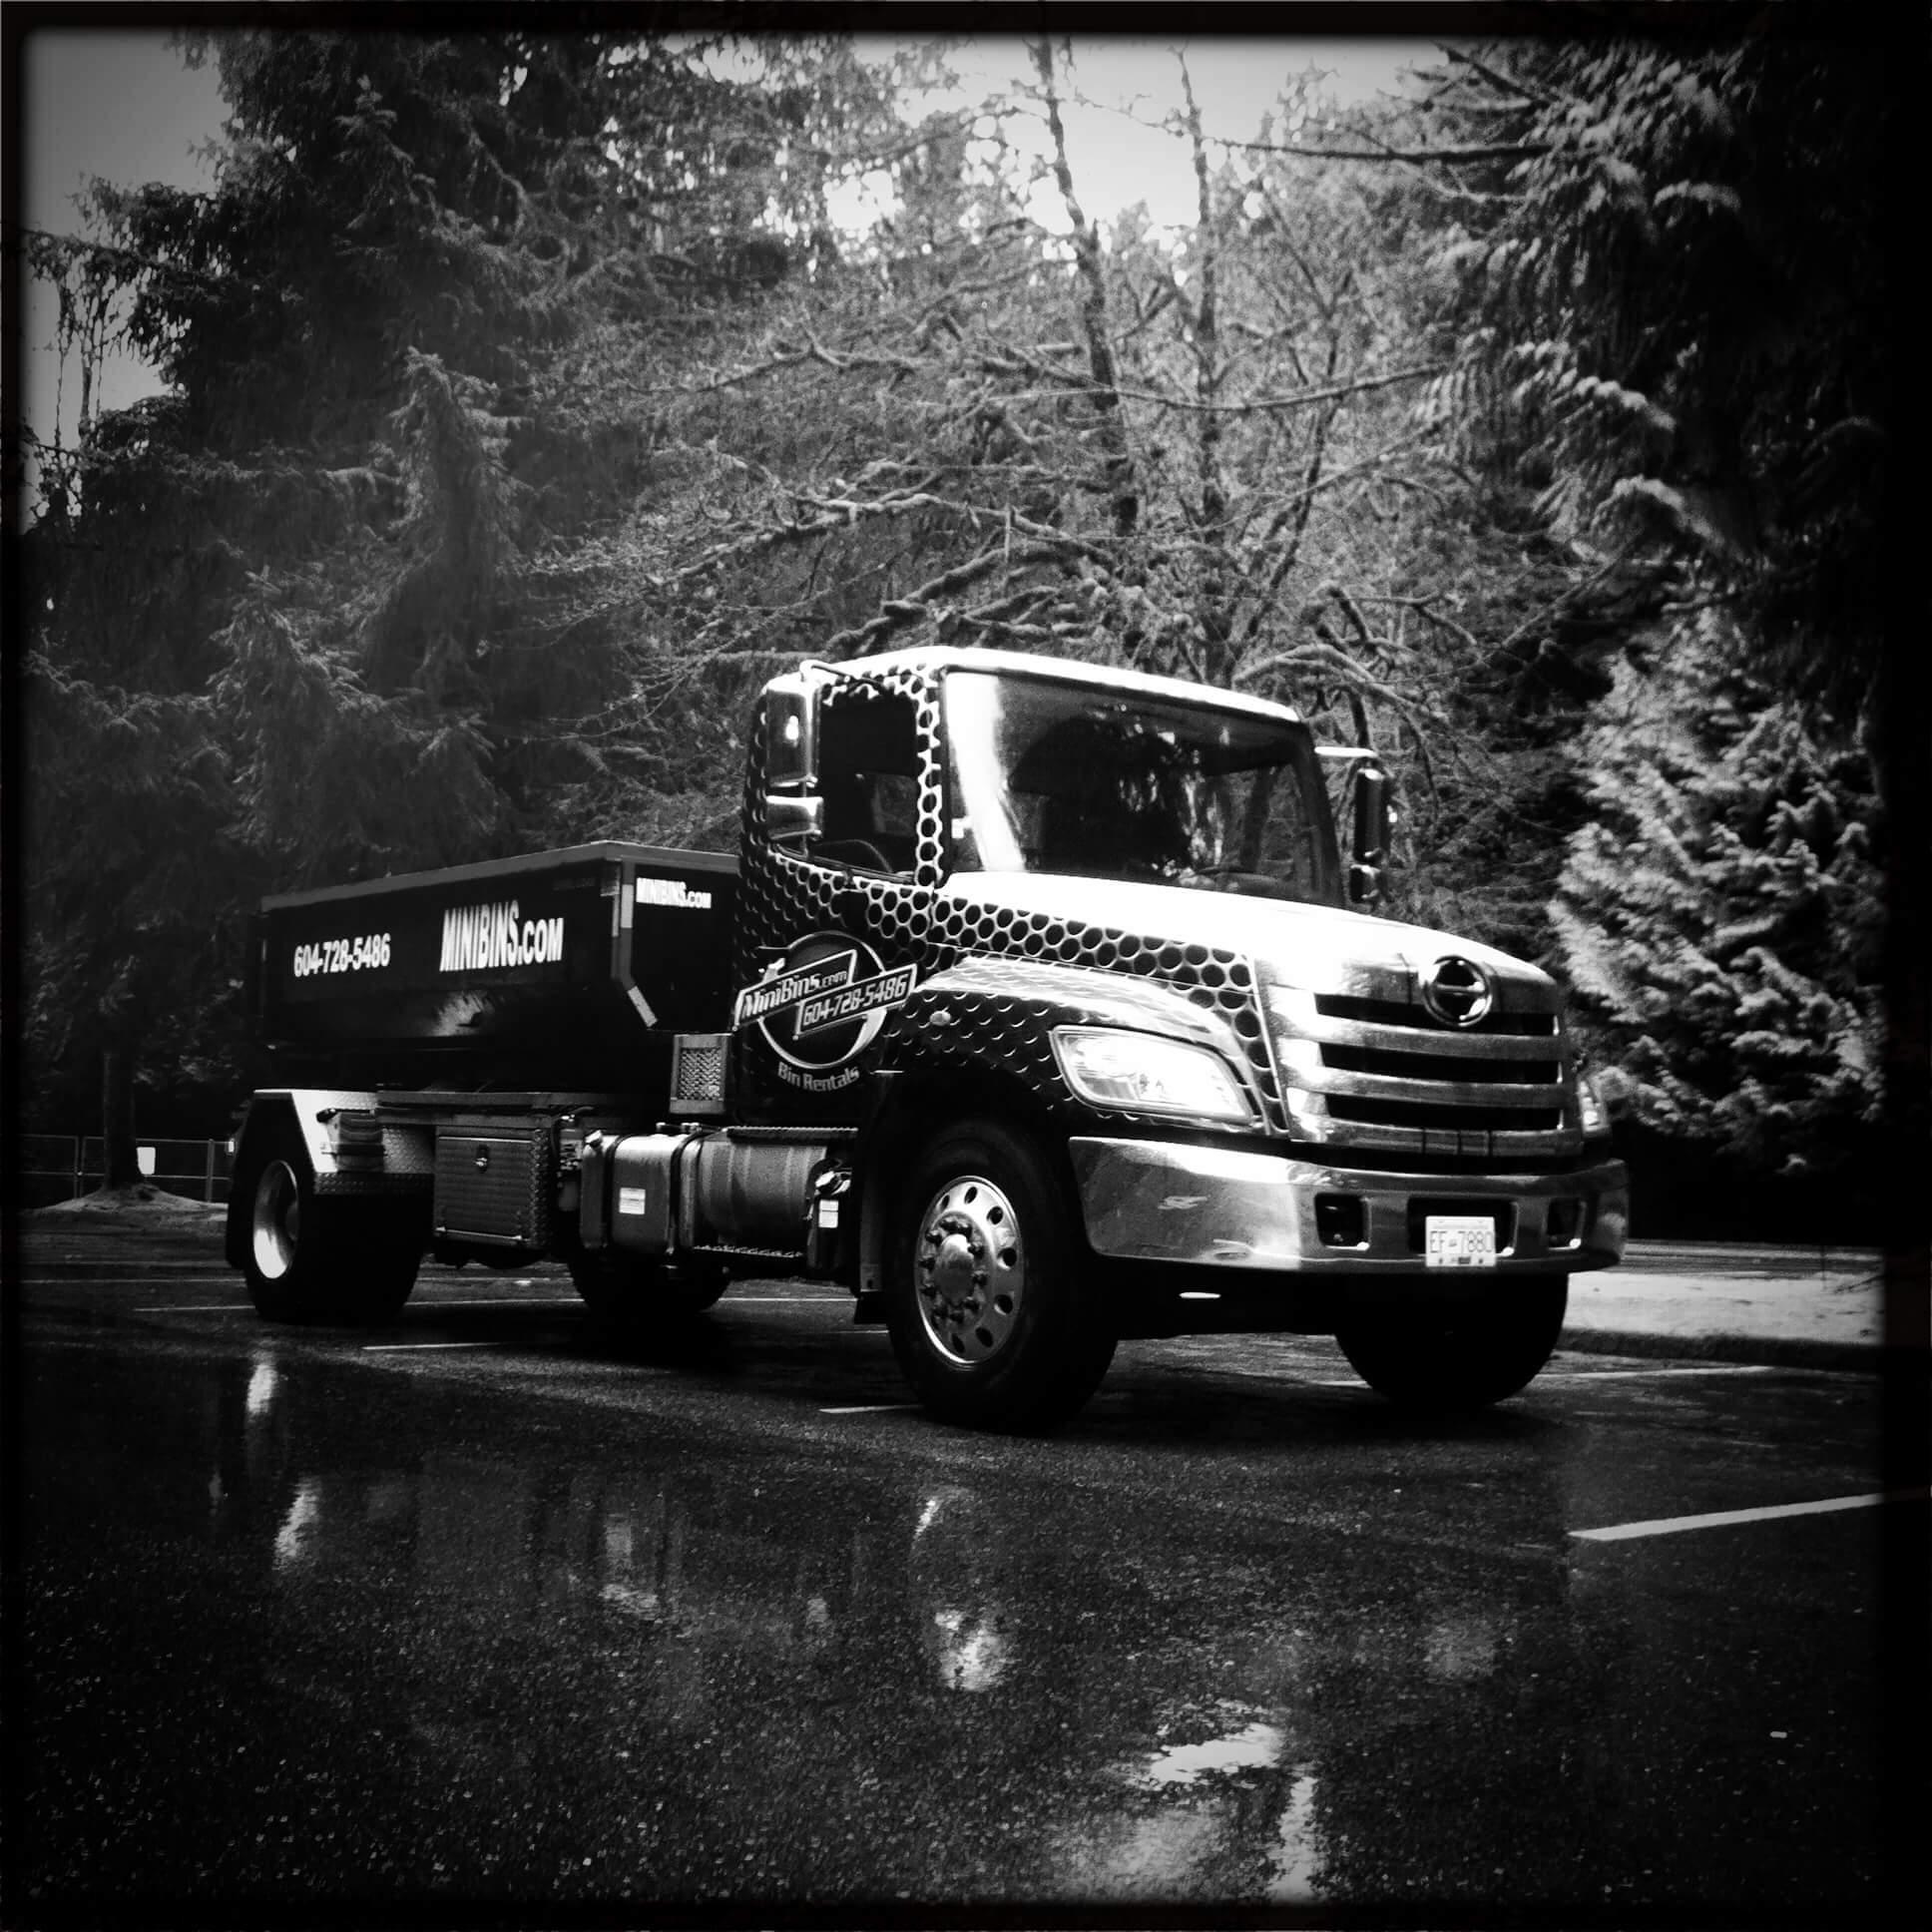 Minibins Truck Black and White